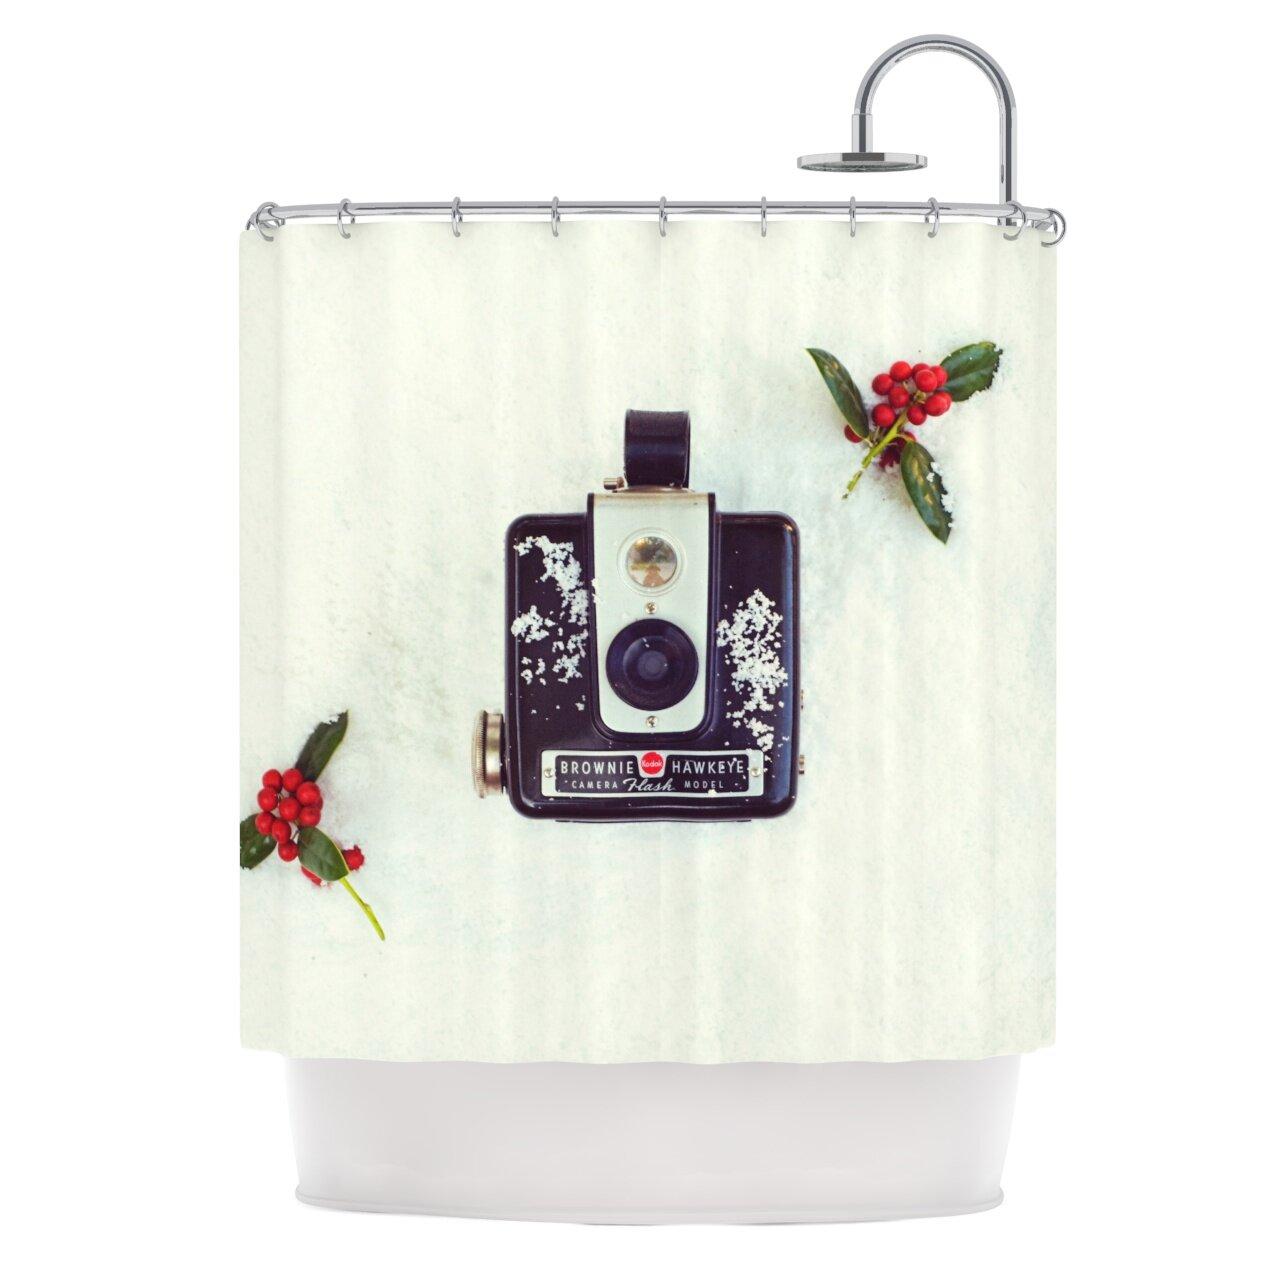 Winter shower curtain - The Four Seasons Winter Shower Curtain